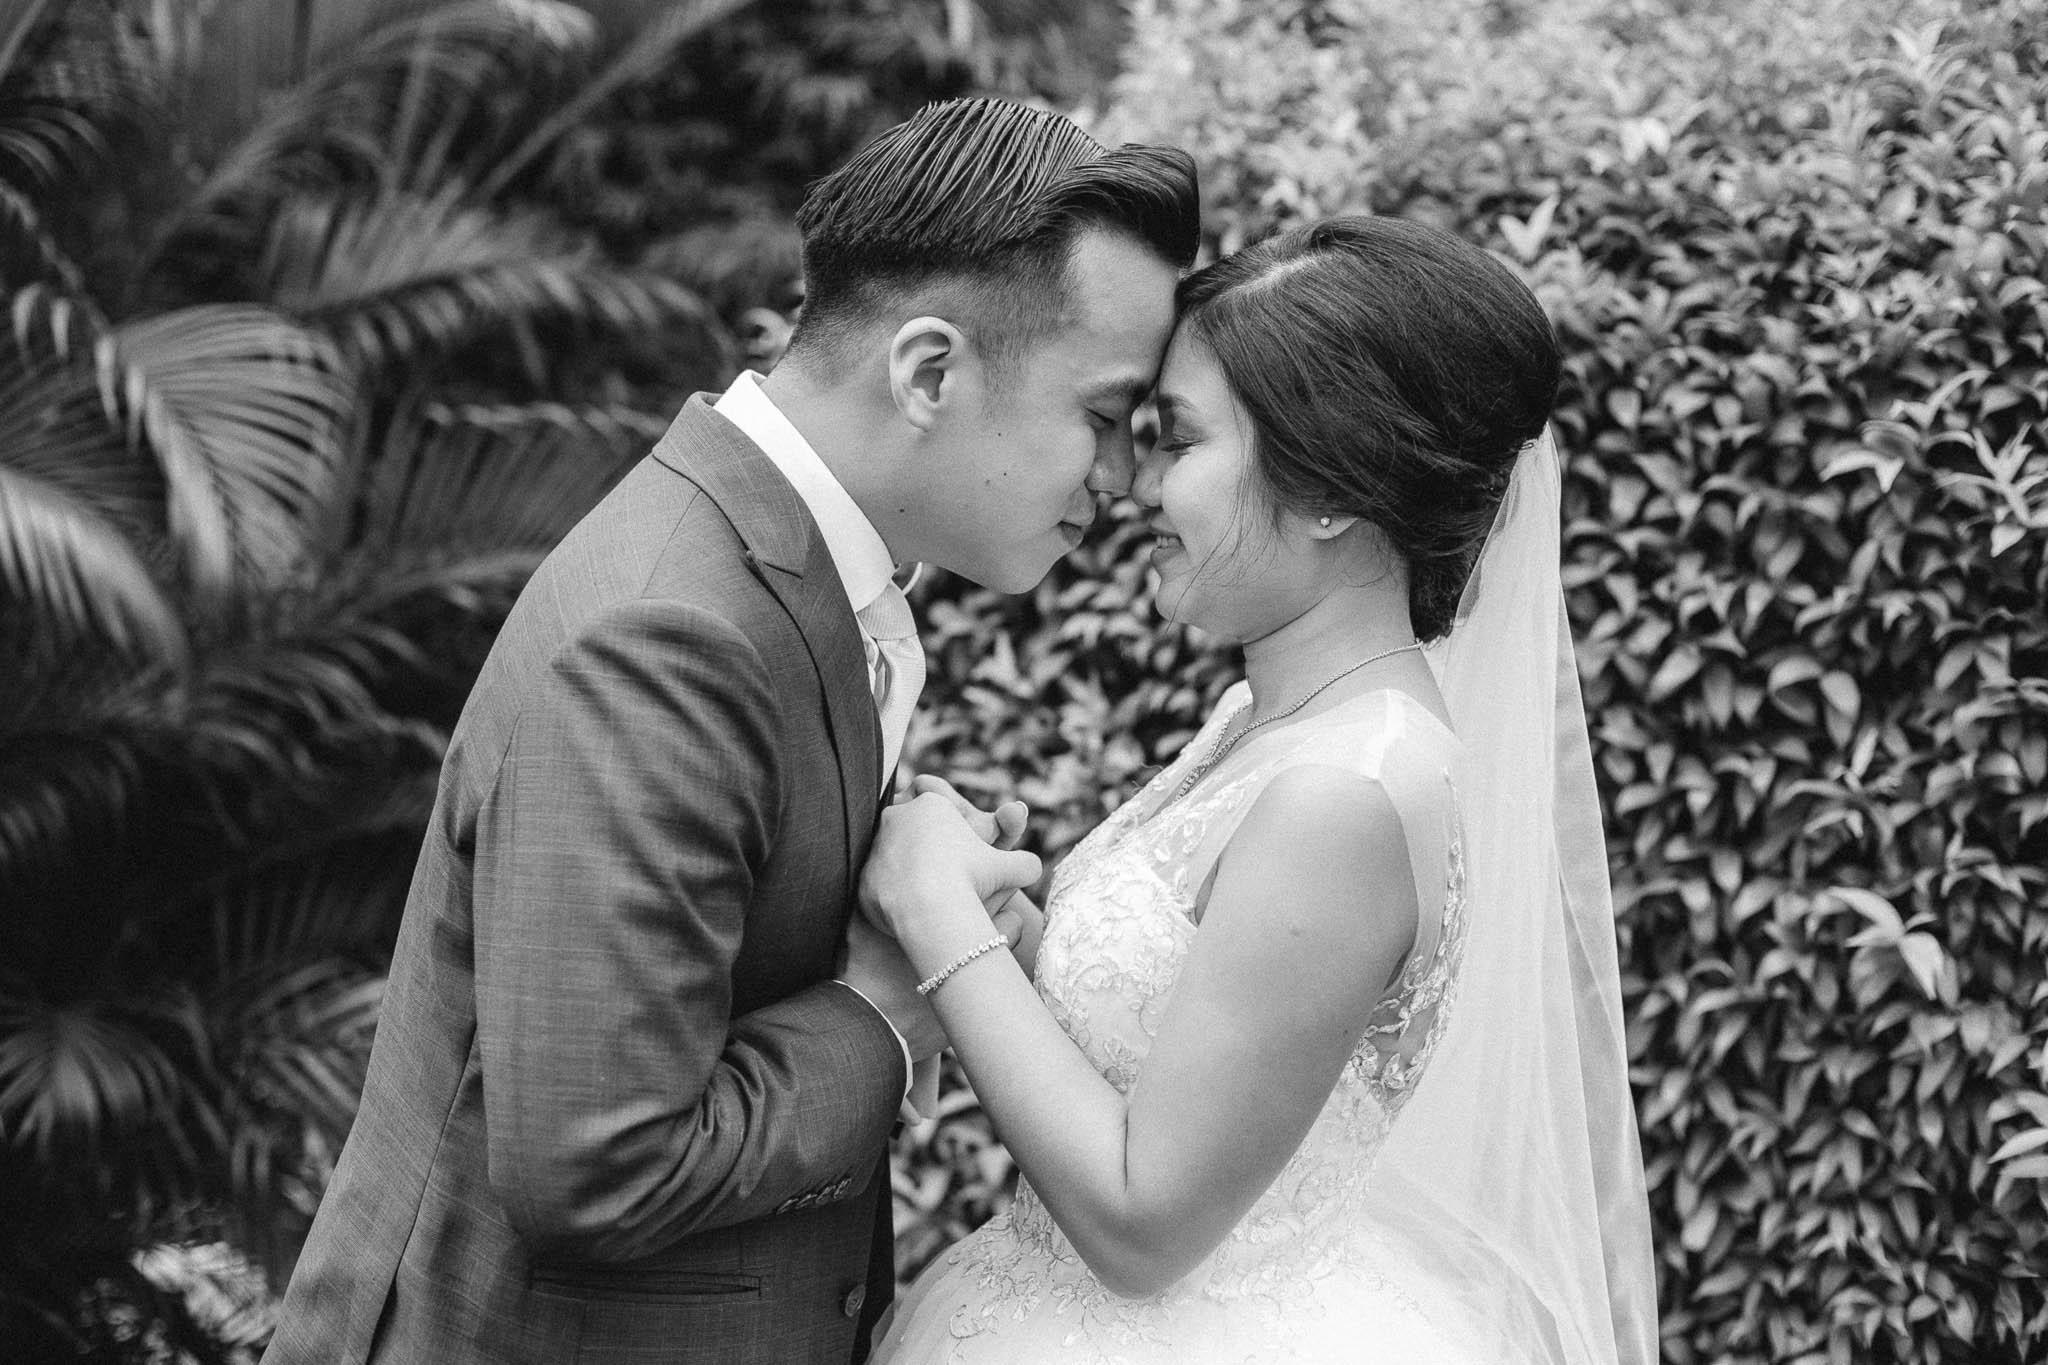 singapore-wedding-photographer-malay-indian-pre-wedding-travel-wmt-2015-jeremy-larissa-52.jpg